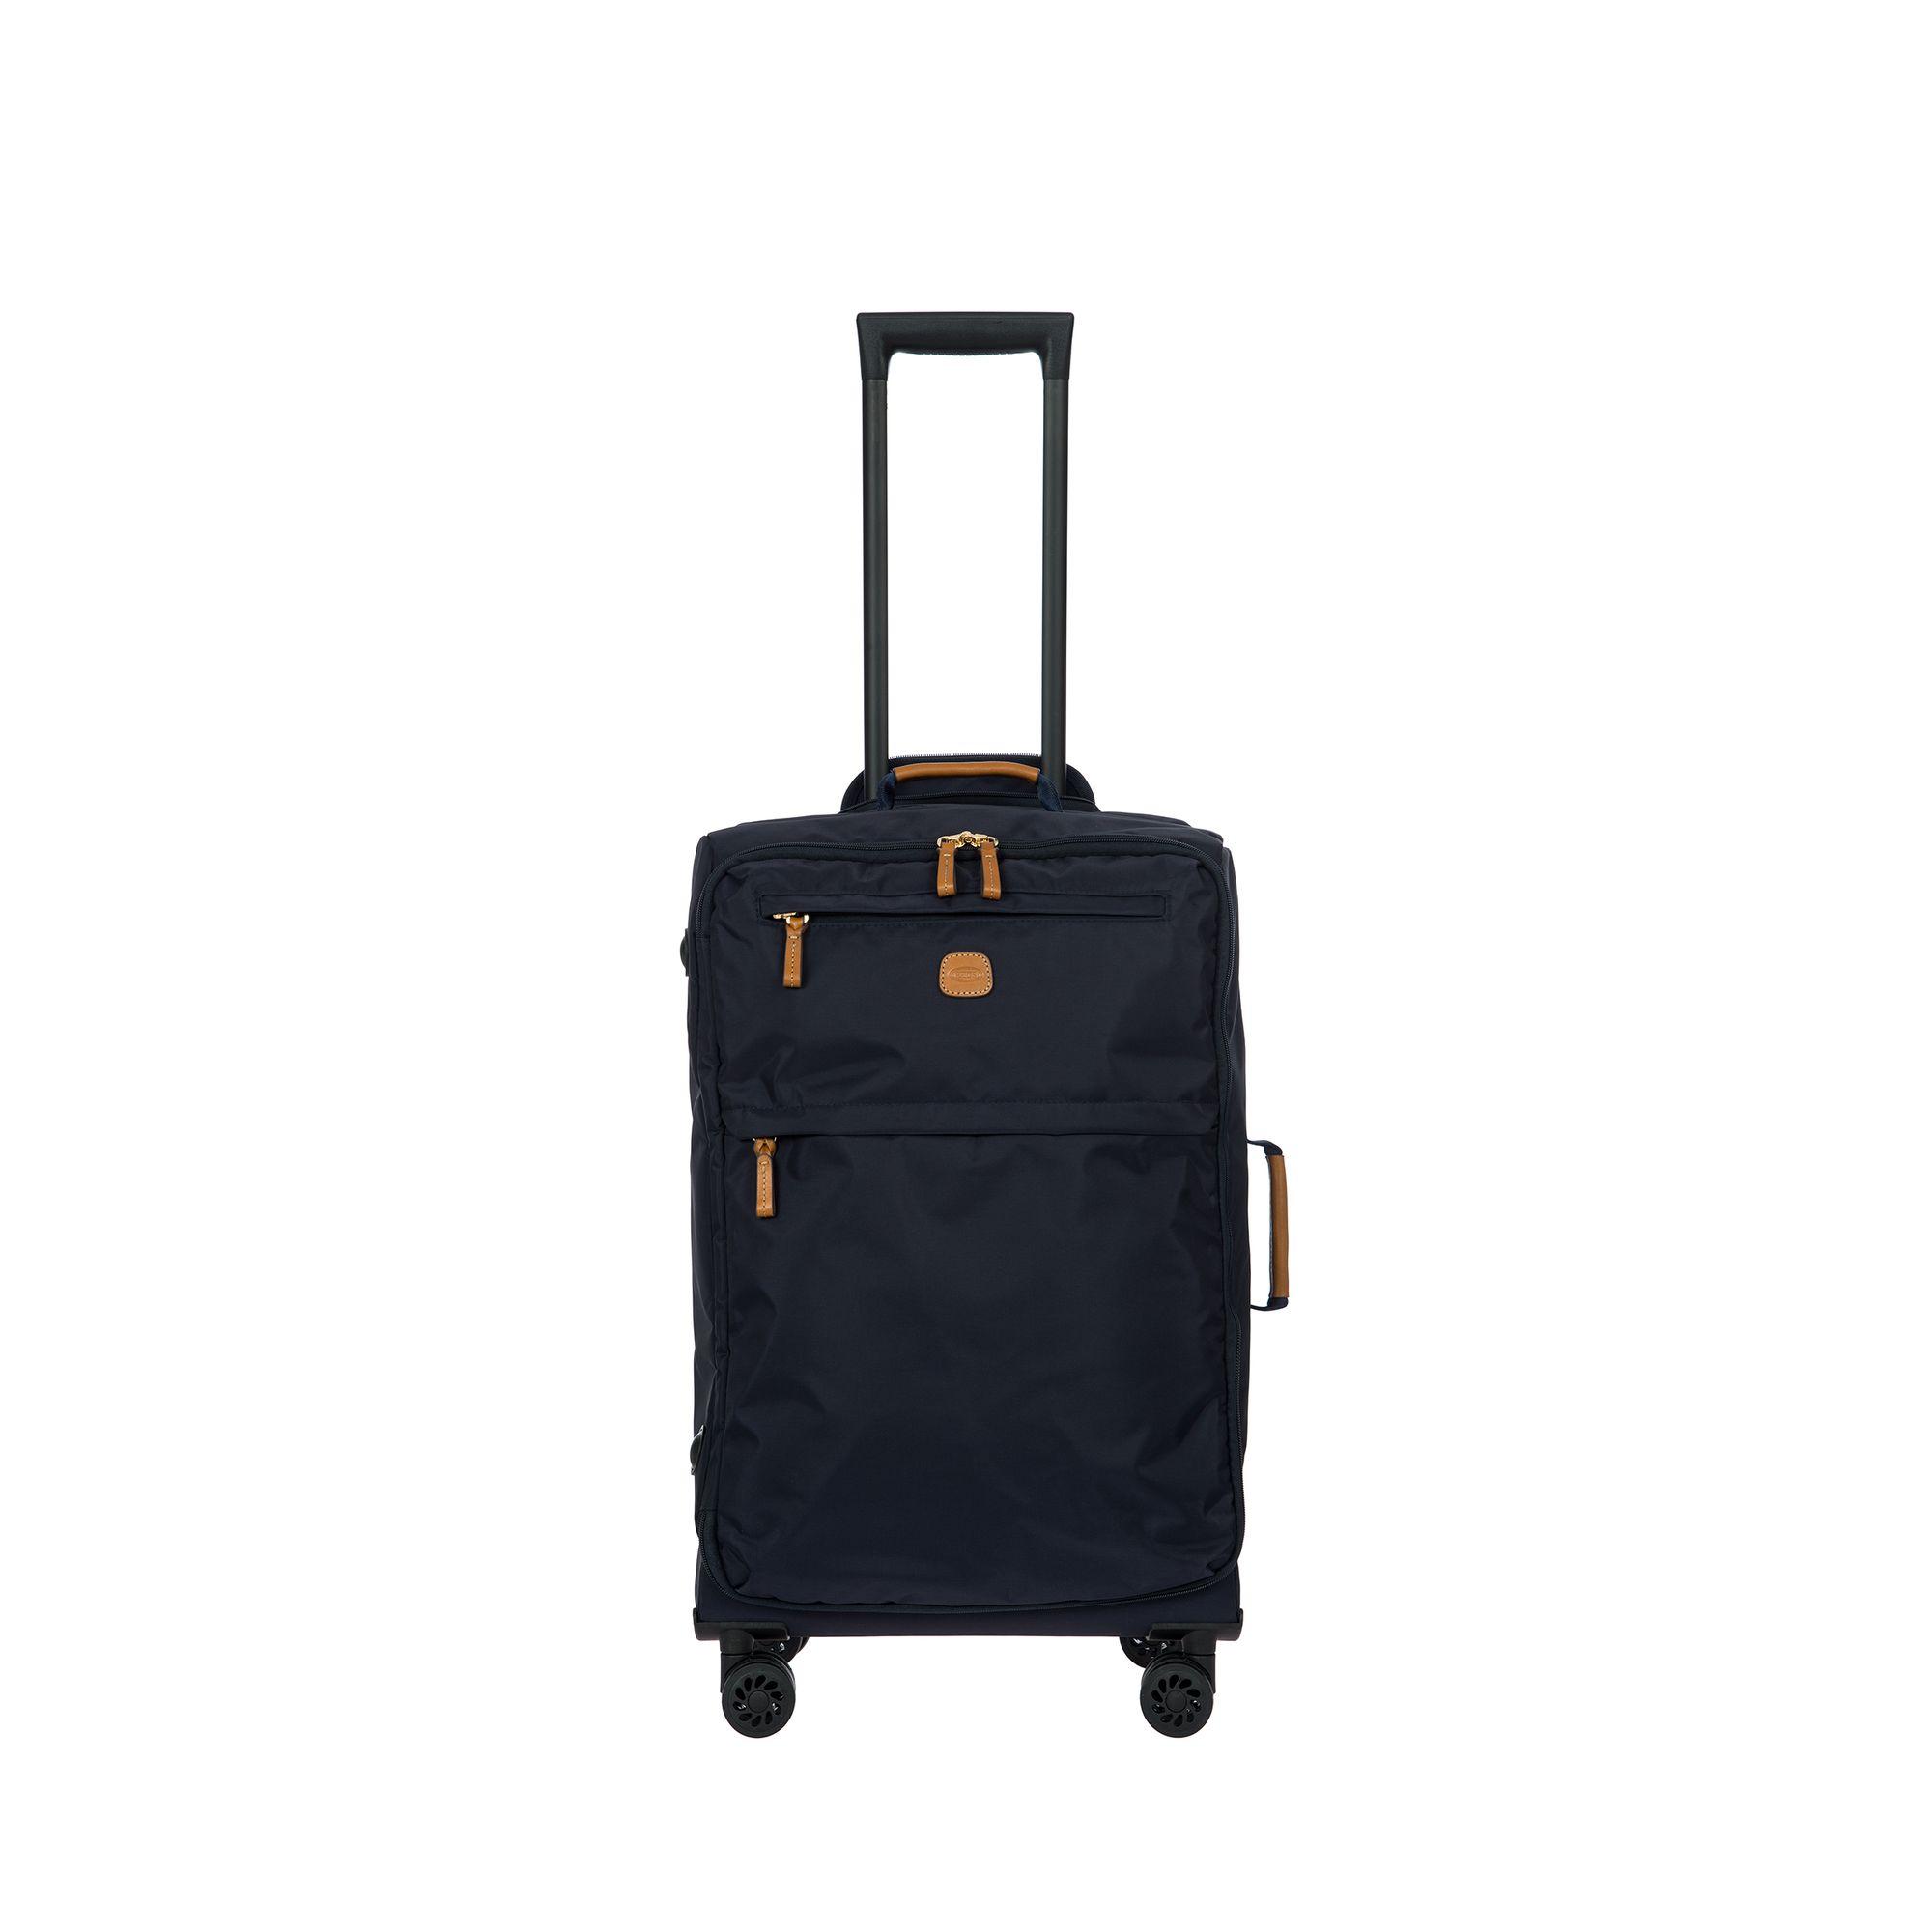 BRIC'S X-Travel mjuk kabinväska i nylon, 4 hjul, 55 cm, Mörkblå